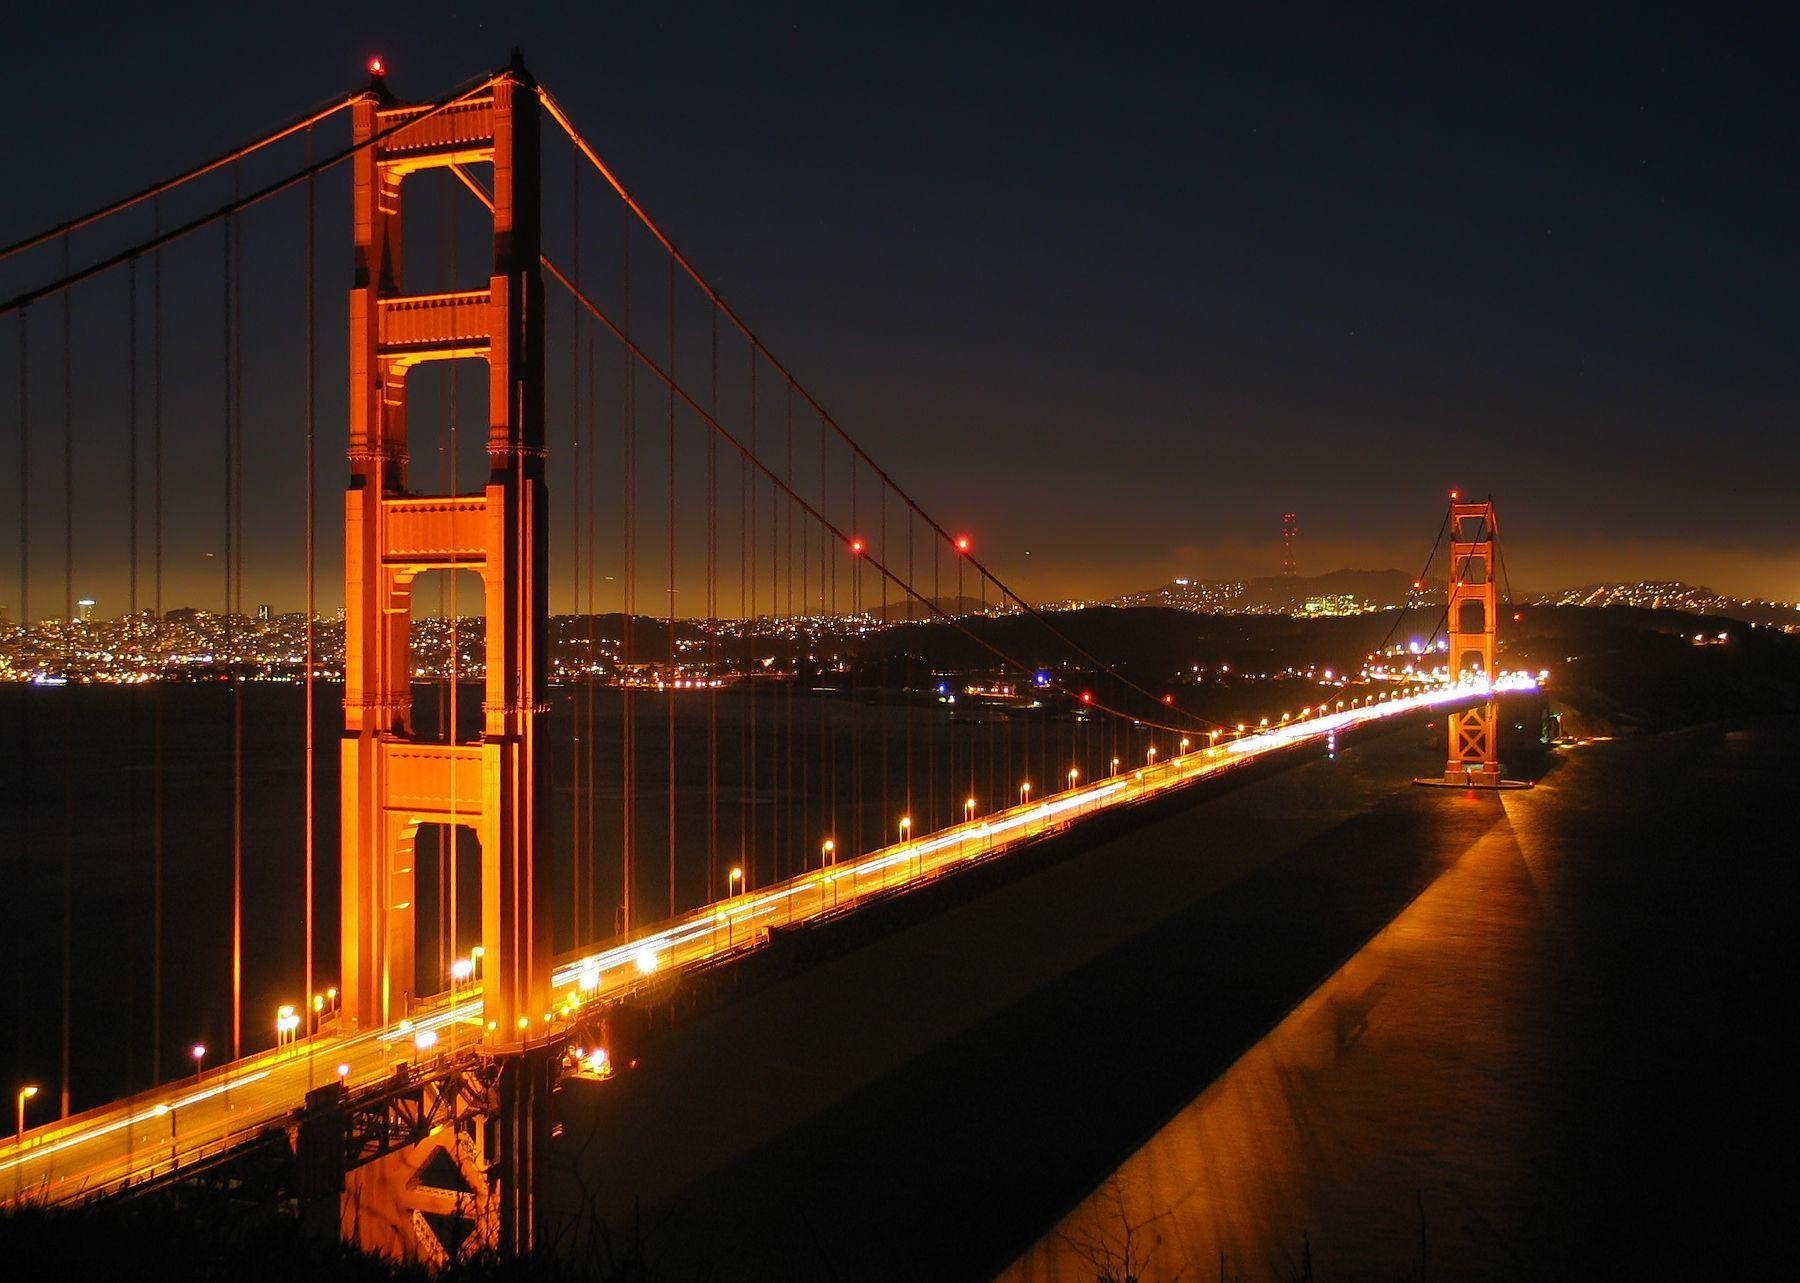 Ggb_by_night - San Francisco #honeymoon | Travel...Travel...Travel ...